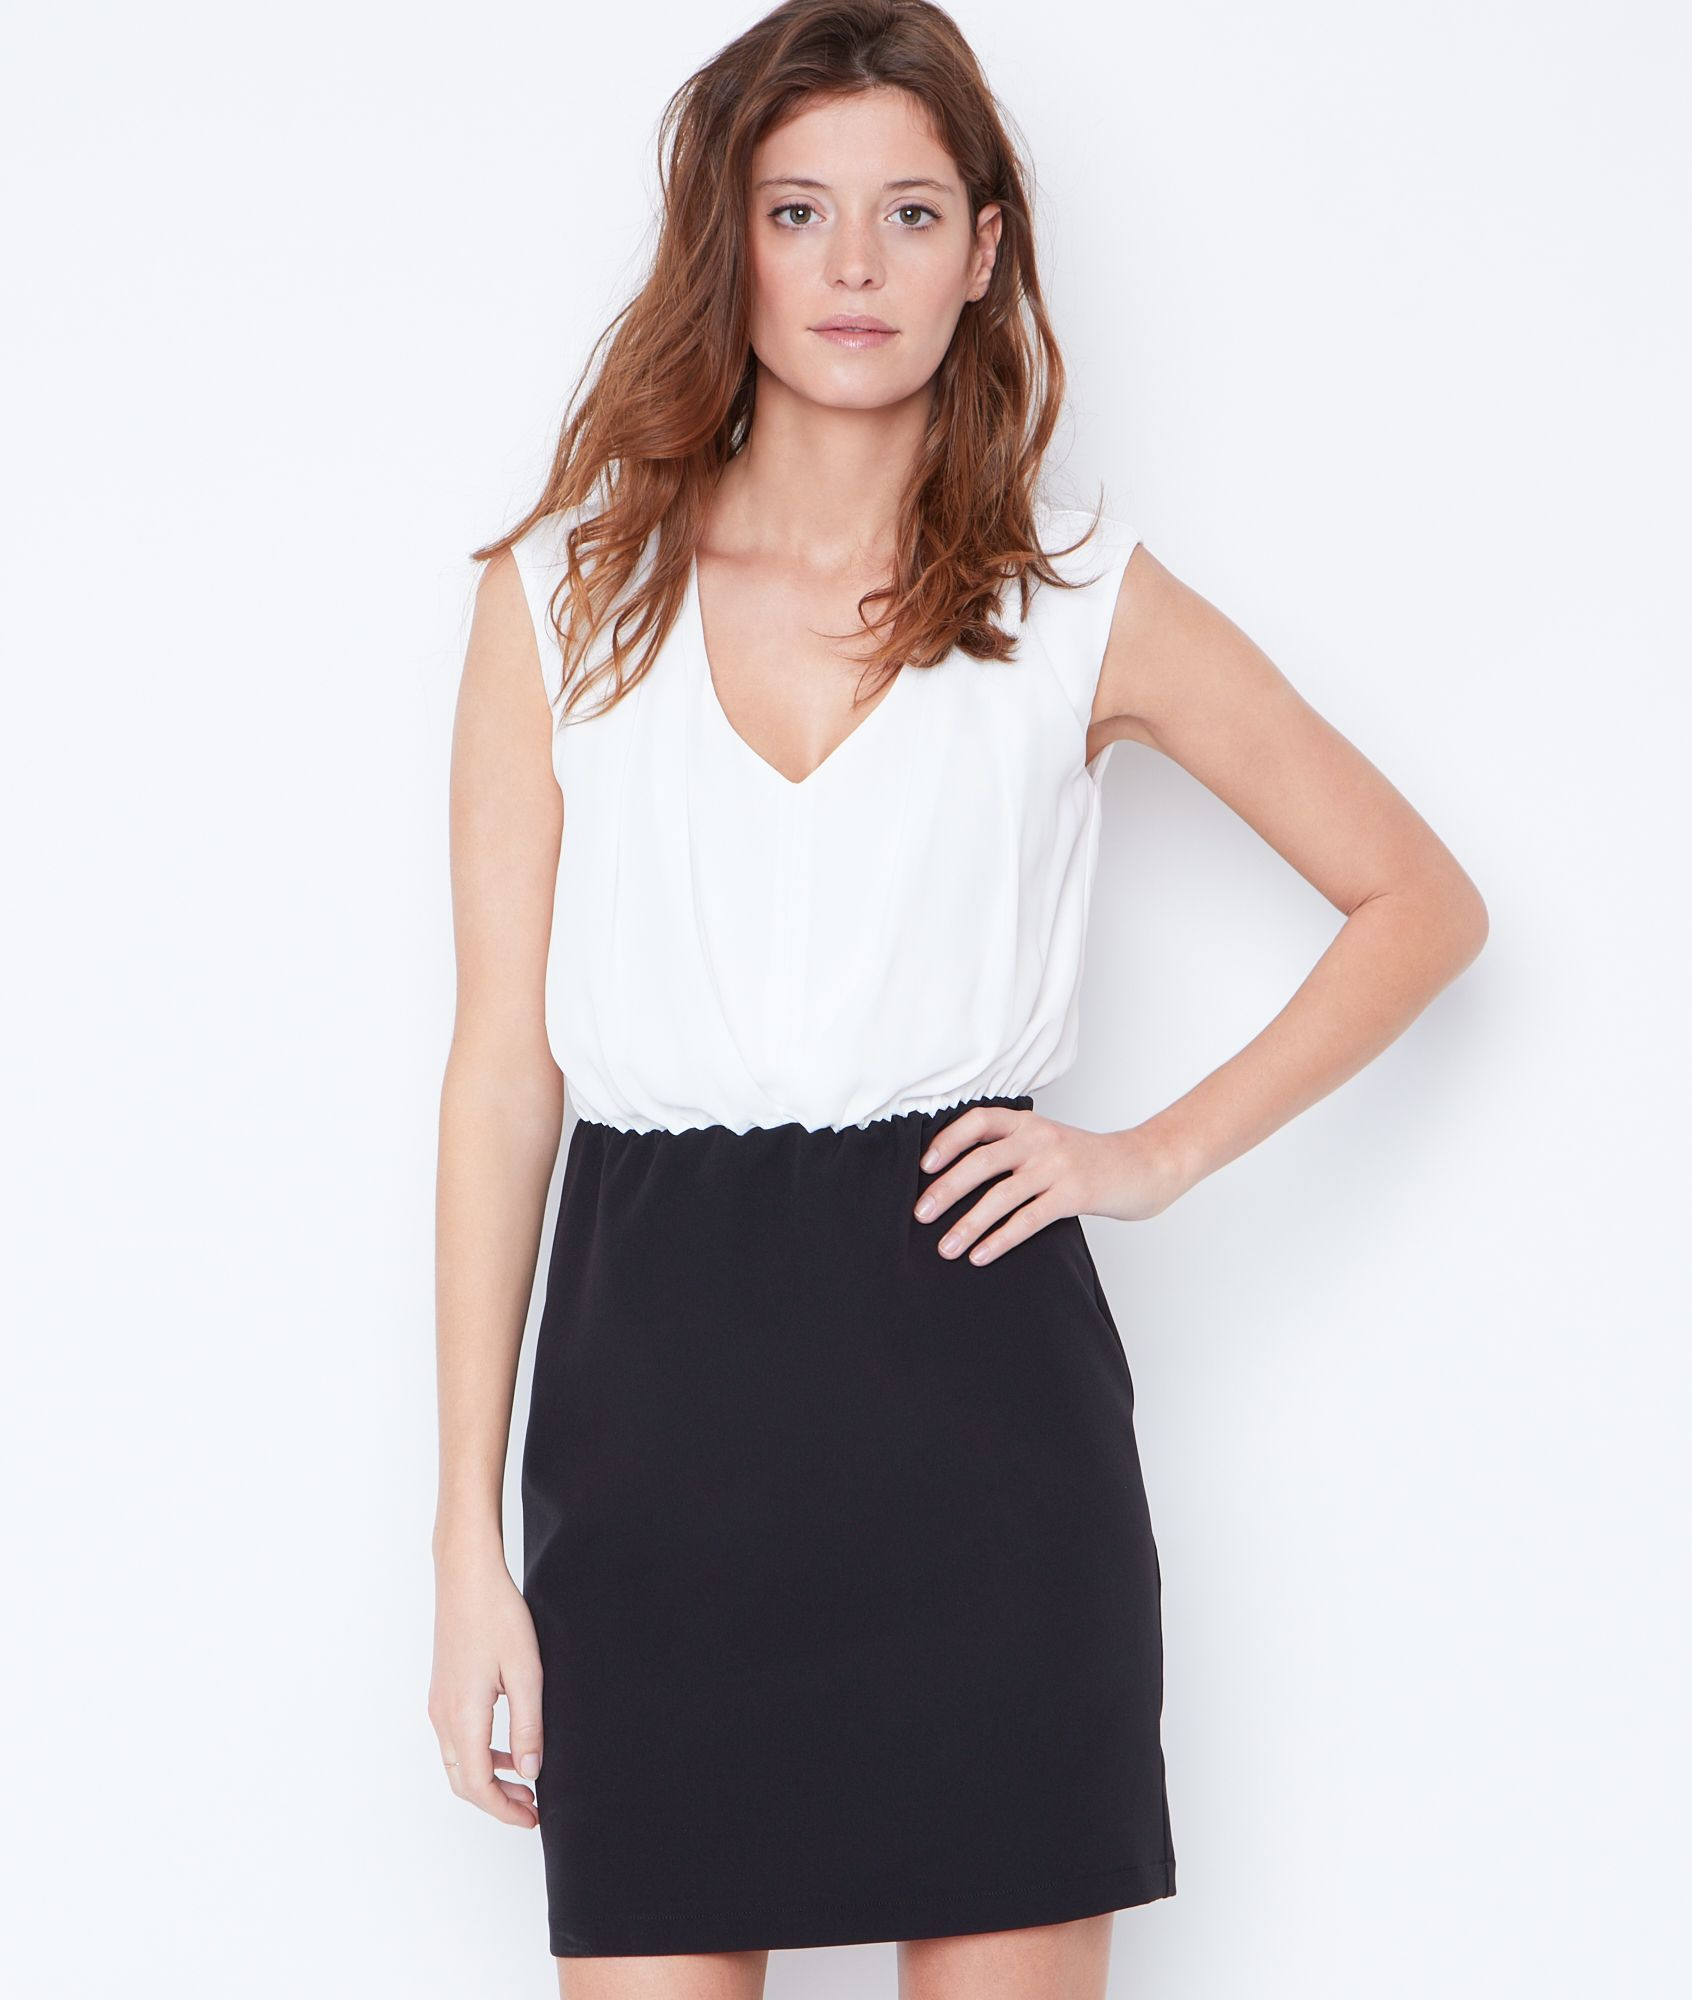 Robe ajustée bicolore - COLIE - BLANC - Etam